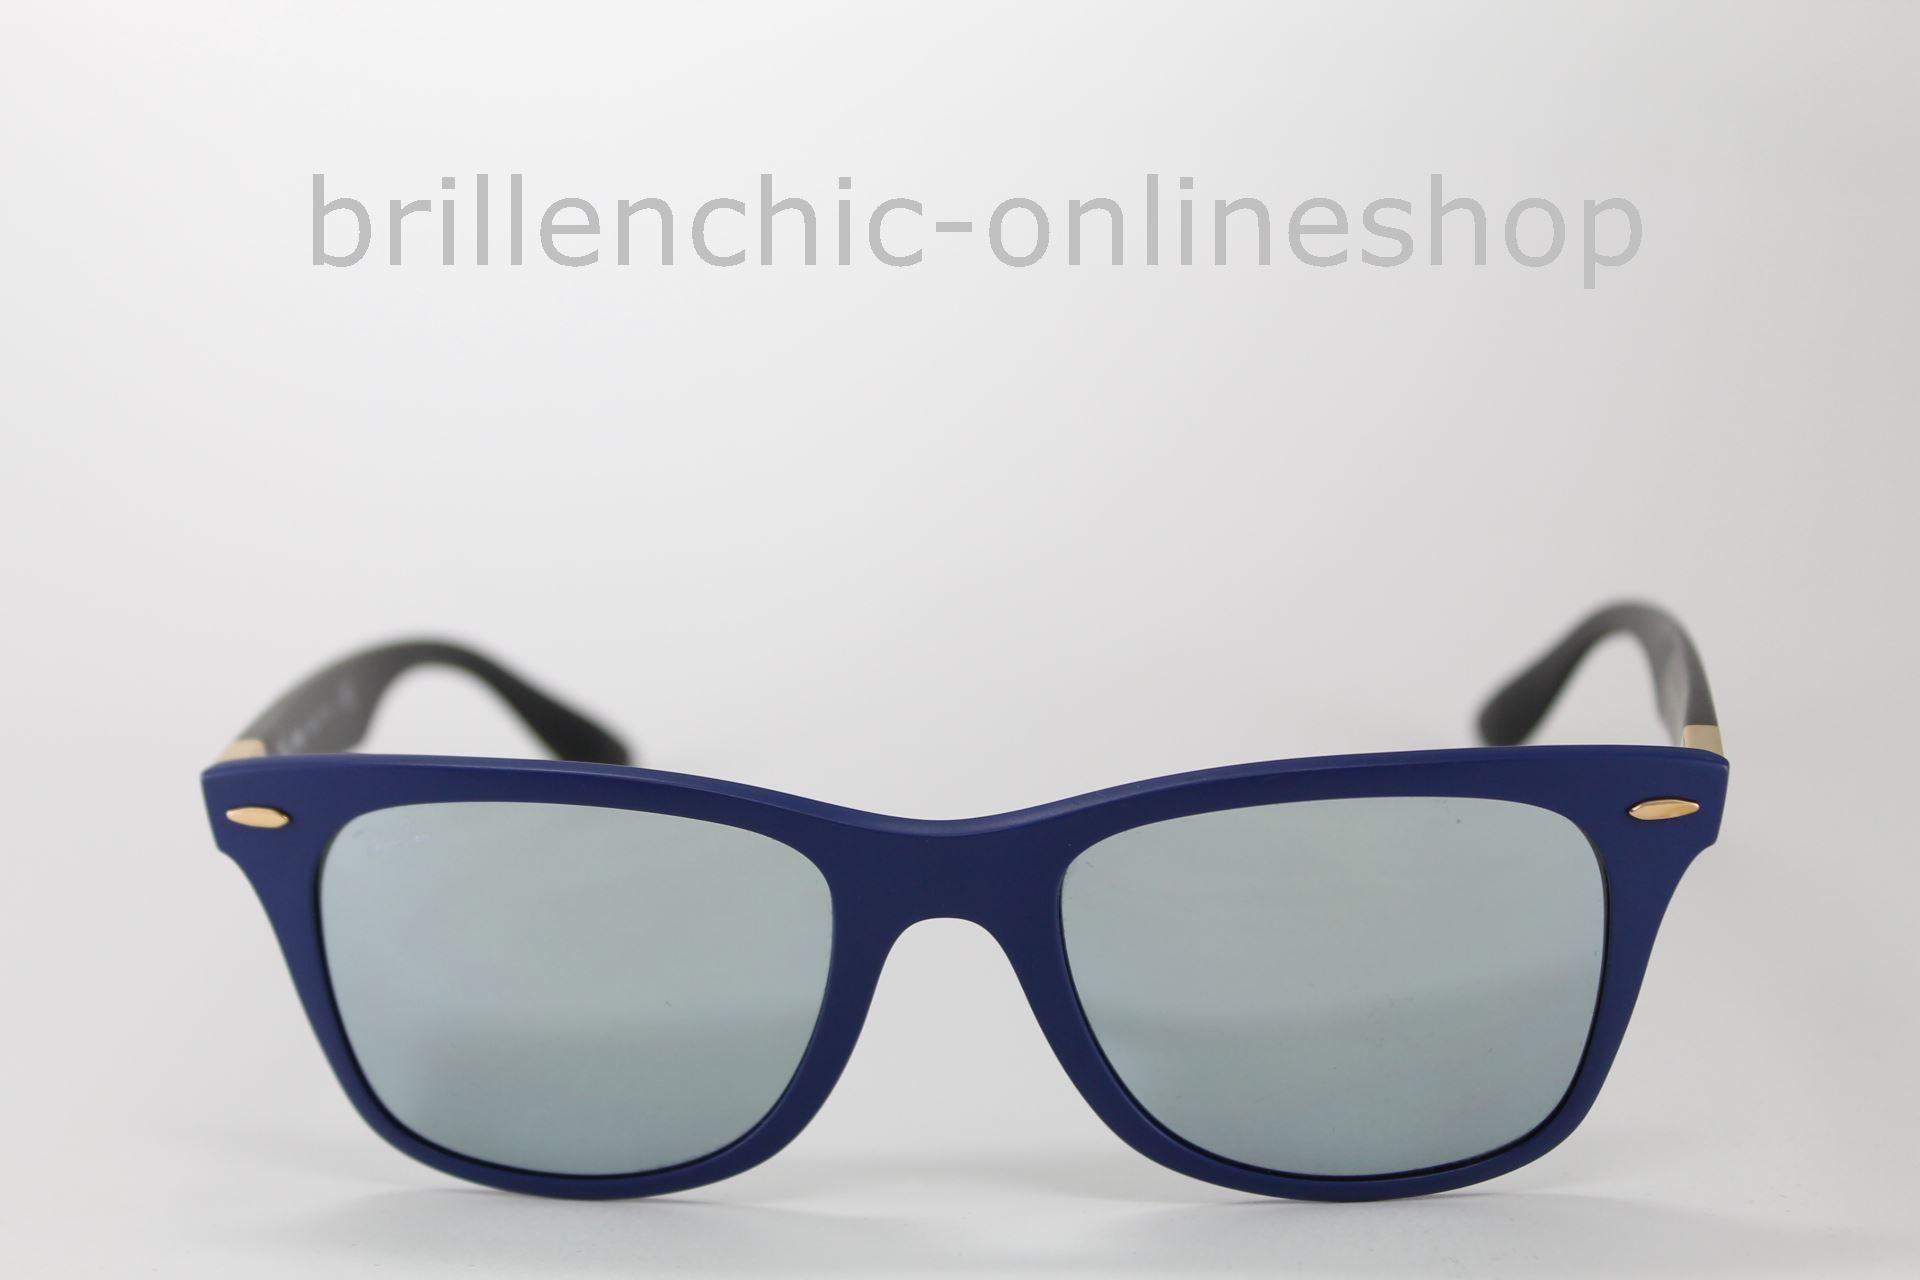 c8a8420e7 Brillenchic-onlineshop in Berlin - Ray Ban WAYFARER LITEFORCE RB ...